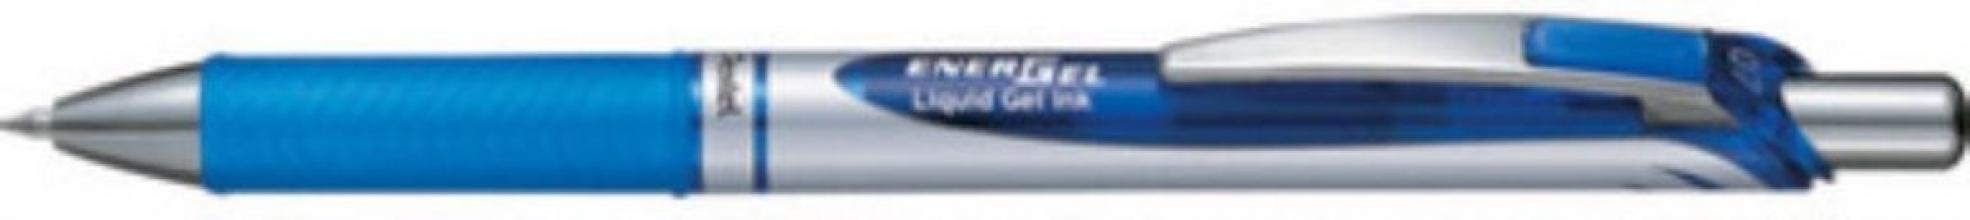 , Gelschrijver Pentel Energel BL77 zwart 0.4mm